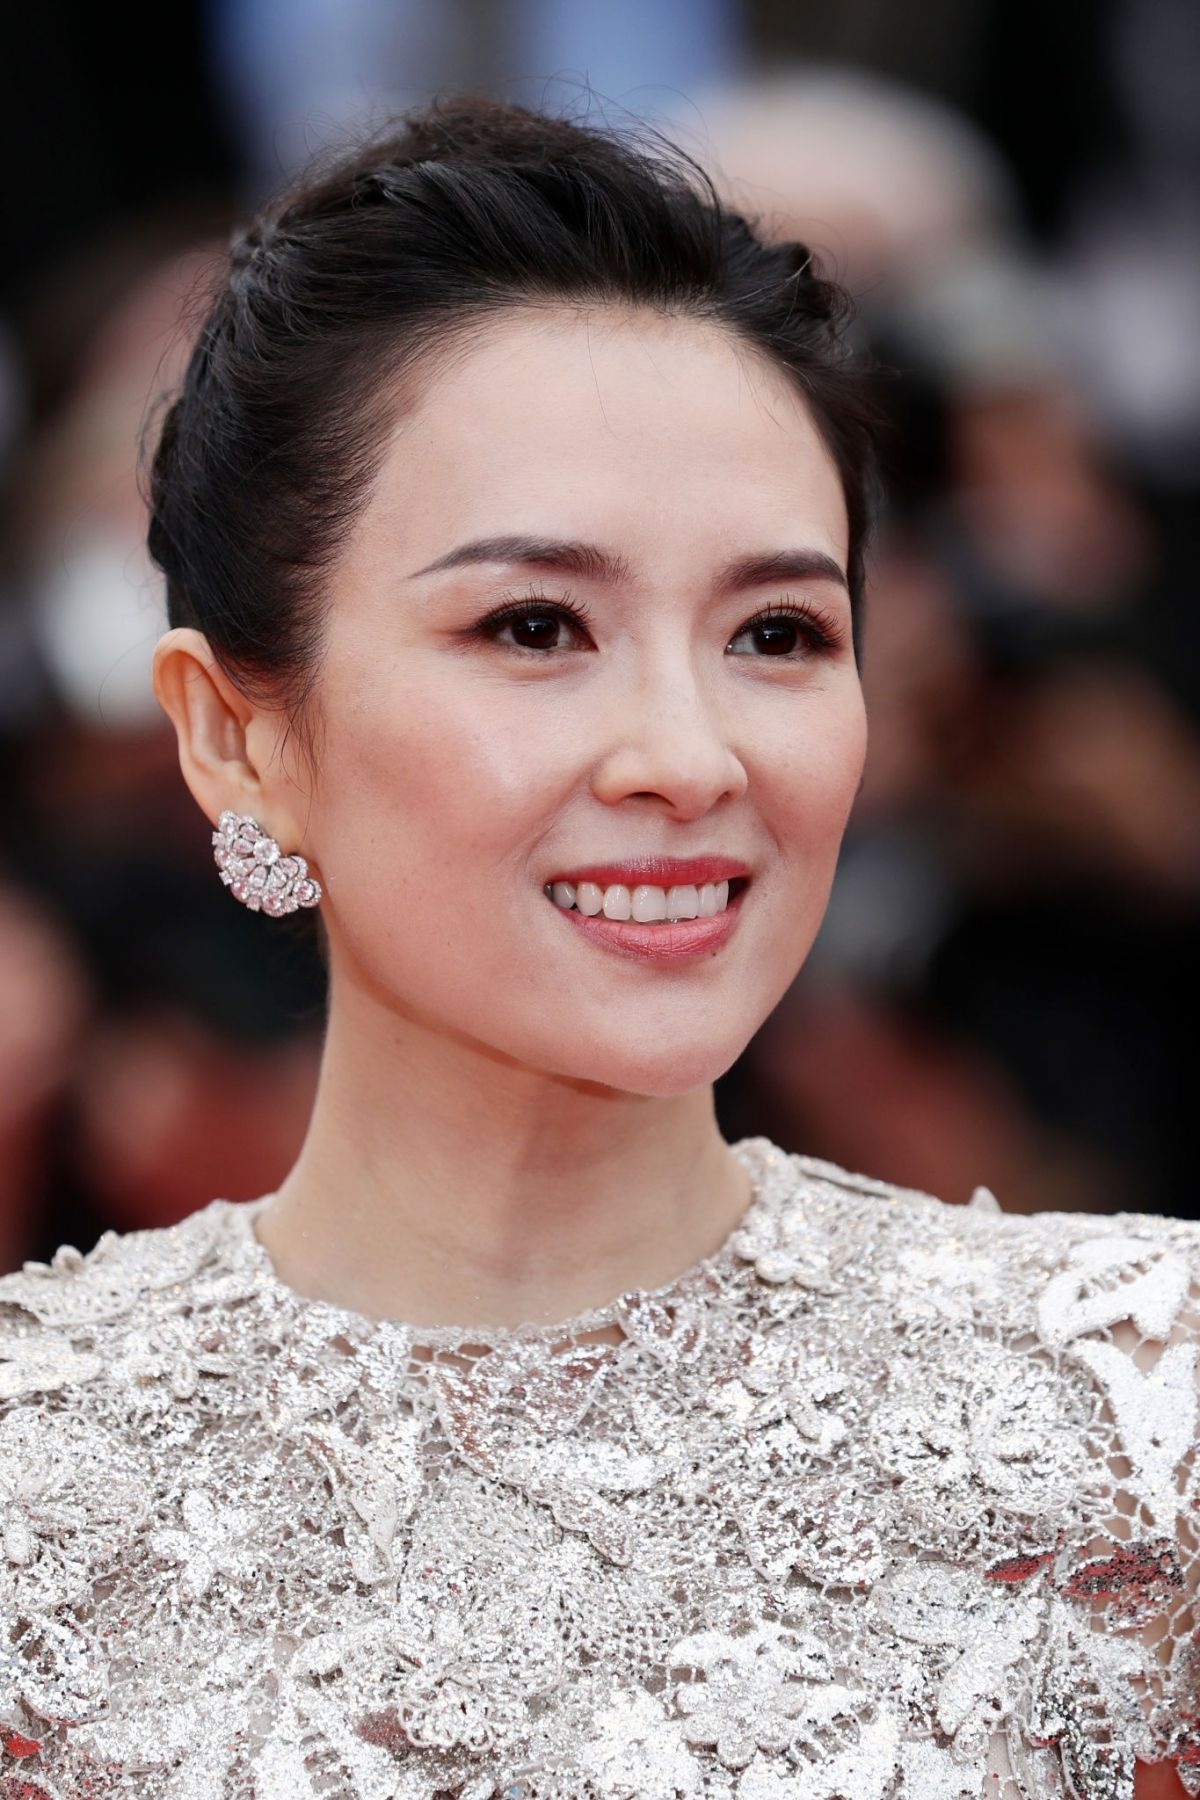 Zhang Ziyi - Official Trophée Chopard Dinner Photocall in